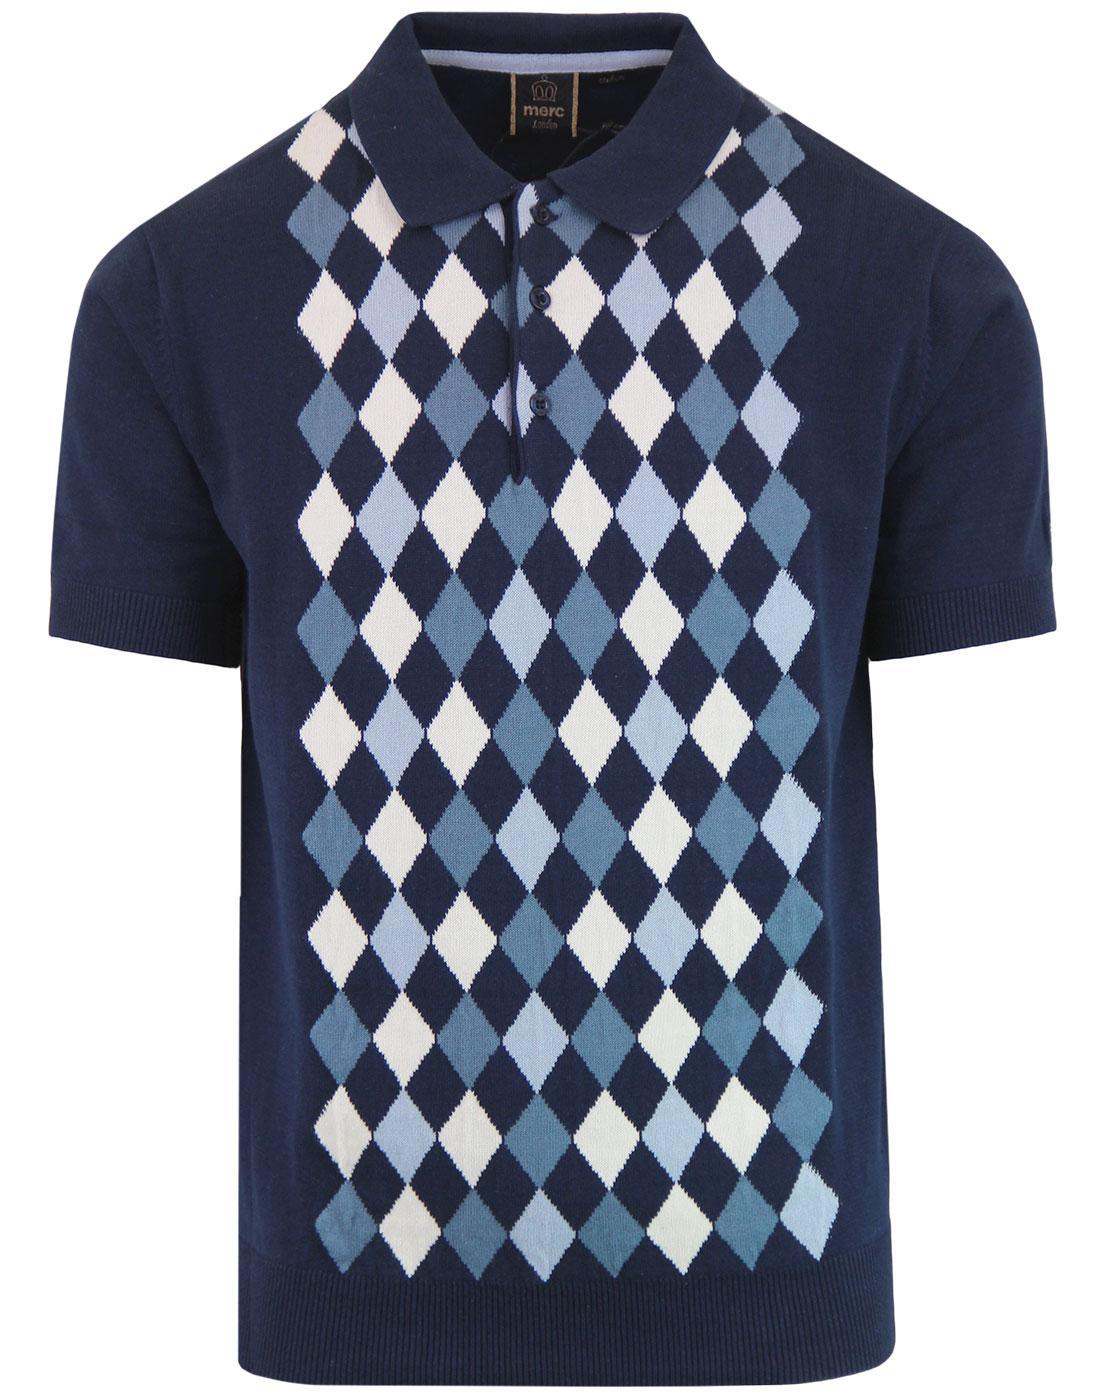 Echo MERC 1960s Mod Argyle Knitted Polo Shirt NAVY